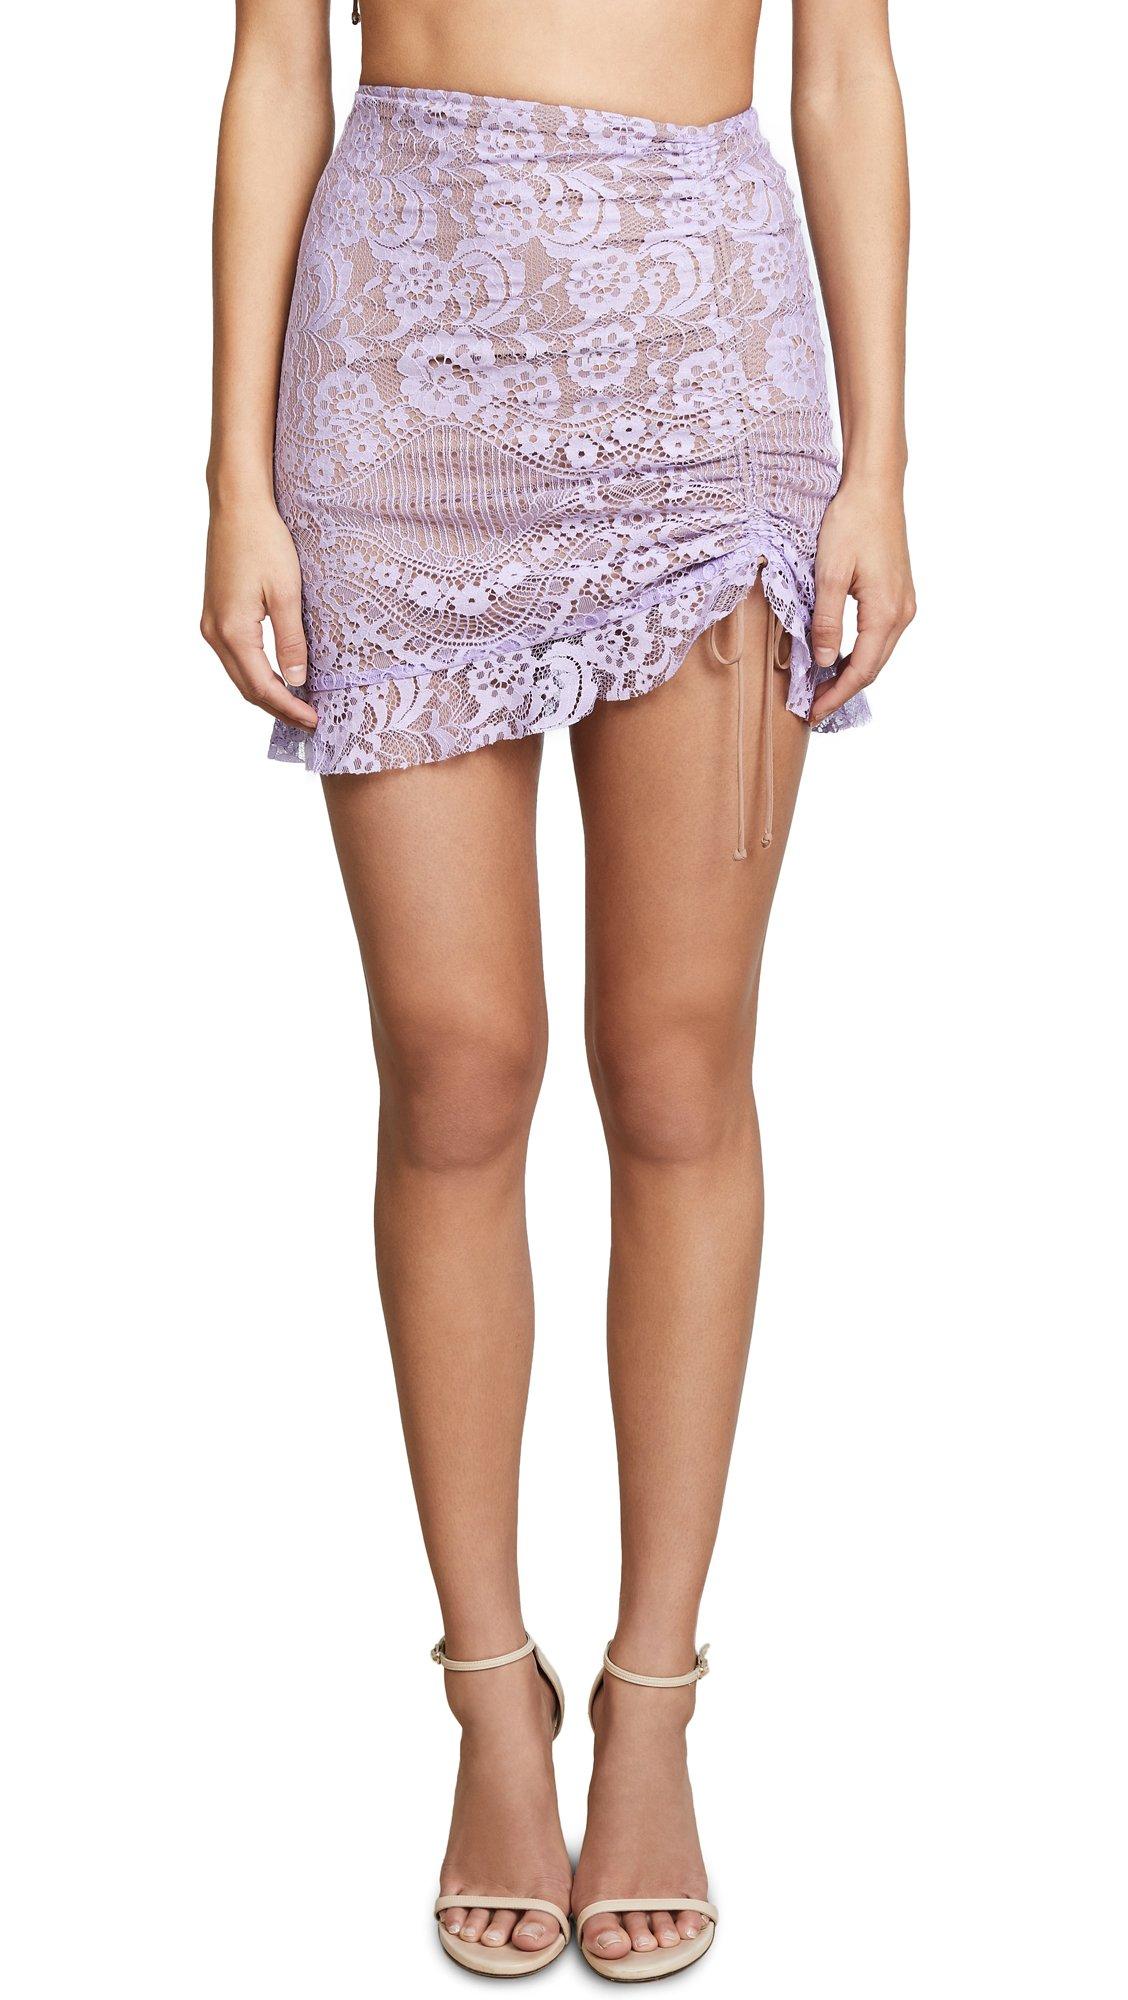 For Love & Lemons Women's Valentina Lace Miniskirt, Lavender, X-Small